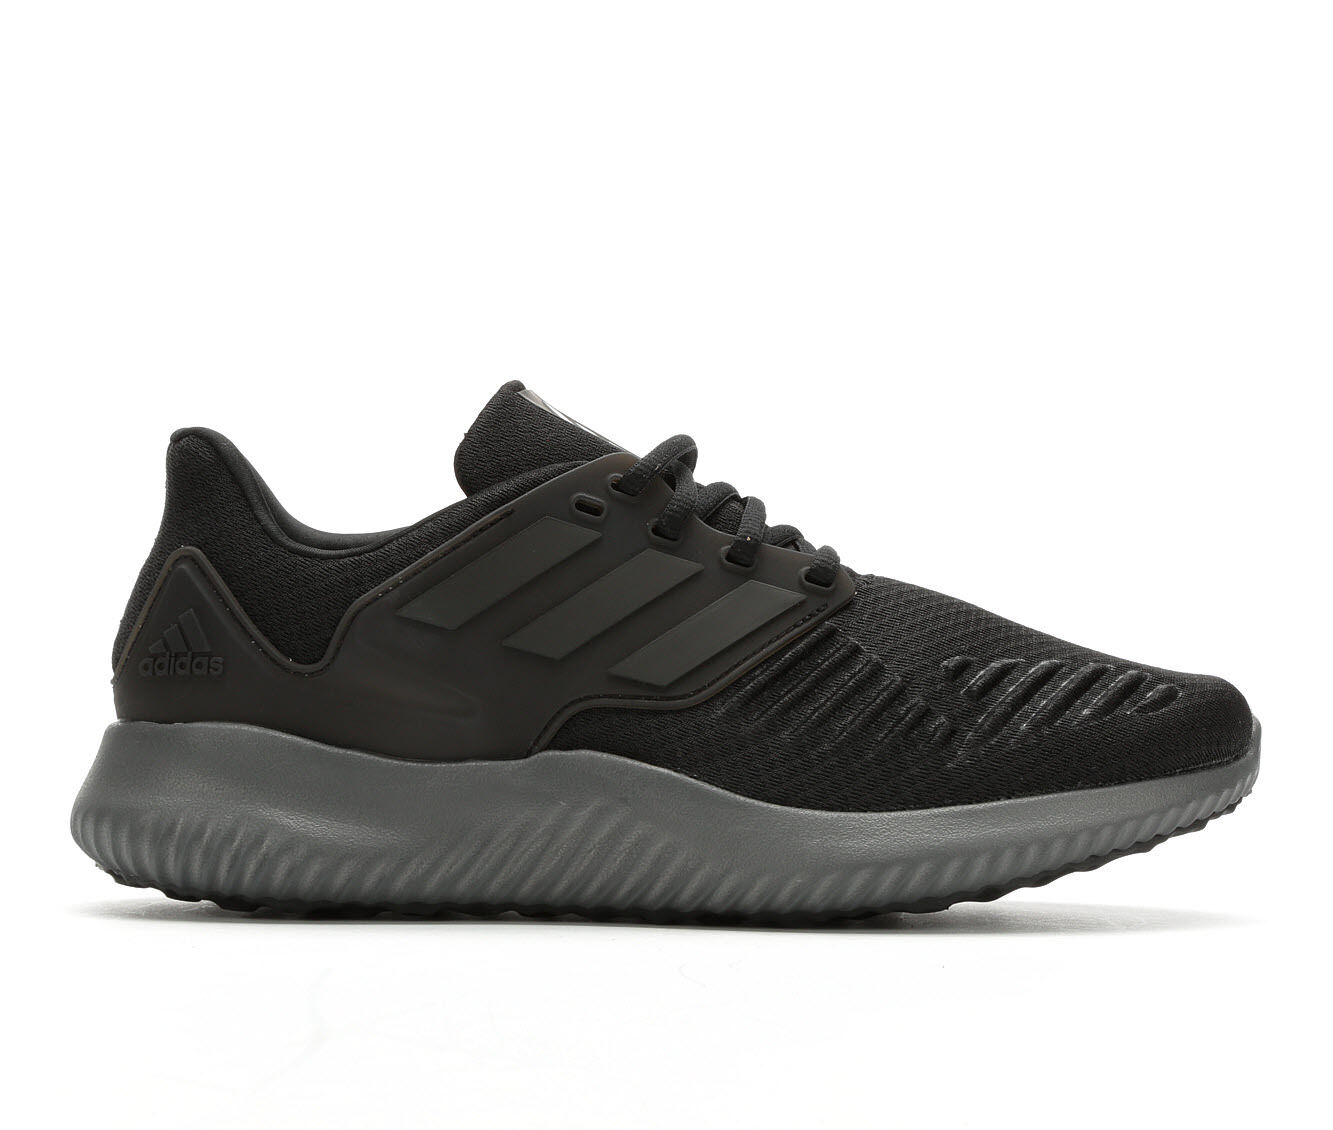 uk shoes_kd1324